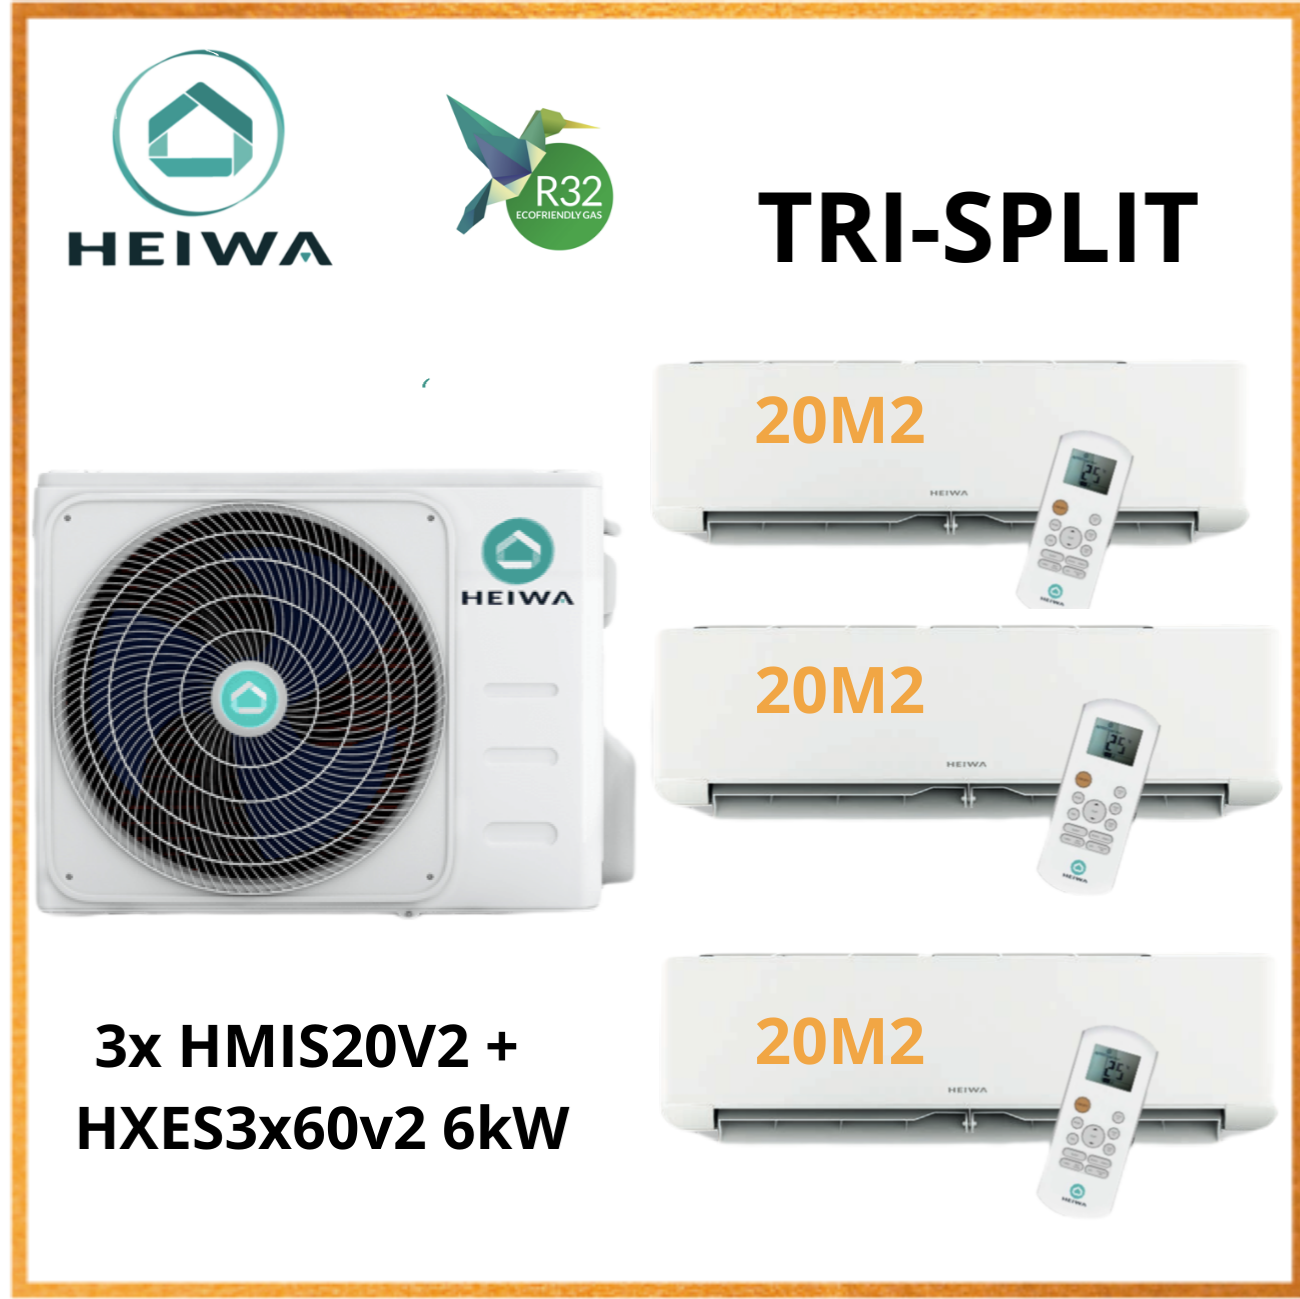 TRI-SPLIT HEIWA 3x HMIS-20-V2 + HXES3X60V2 6kW